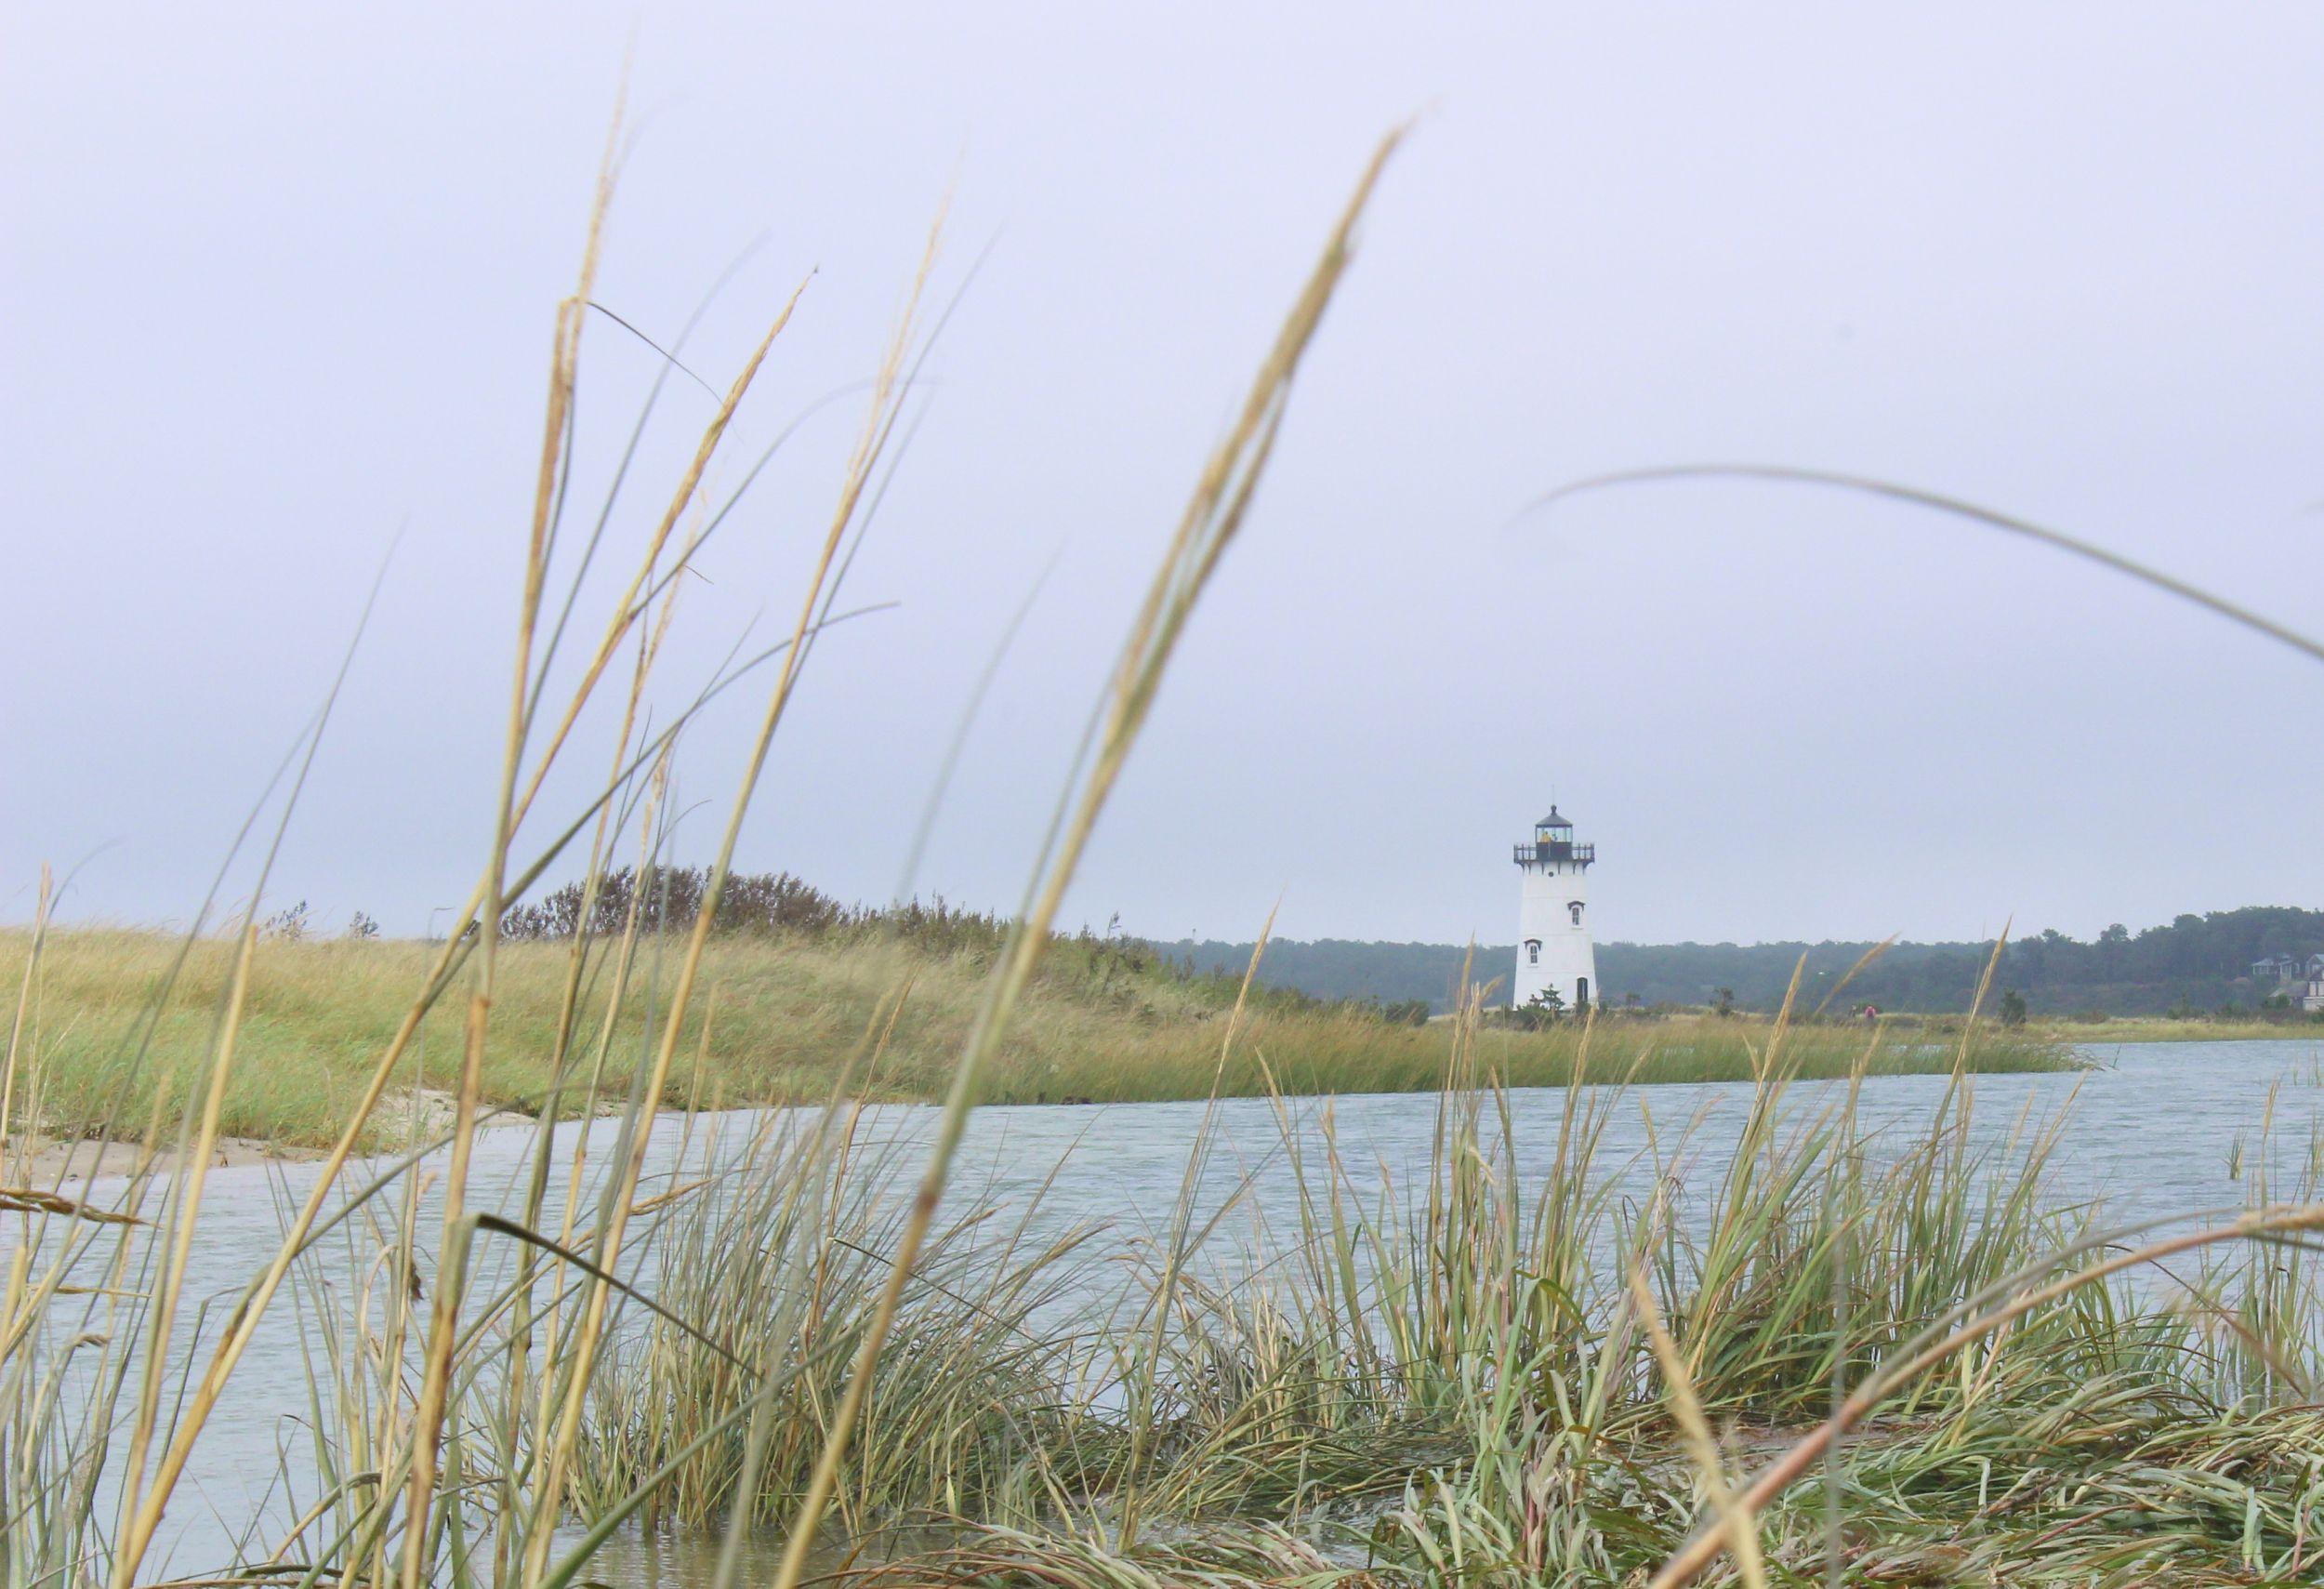 Edgartown_Lighthouse_Beach_Sea_Grass_Sand_Ocean.jpg